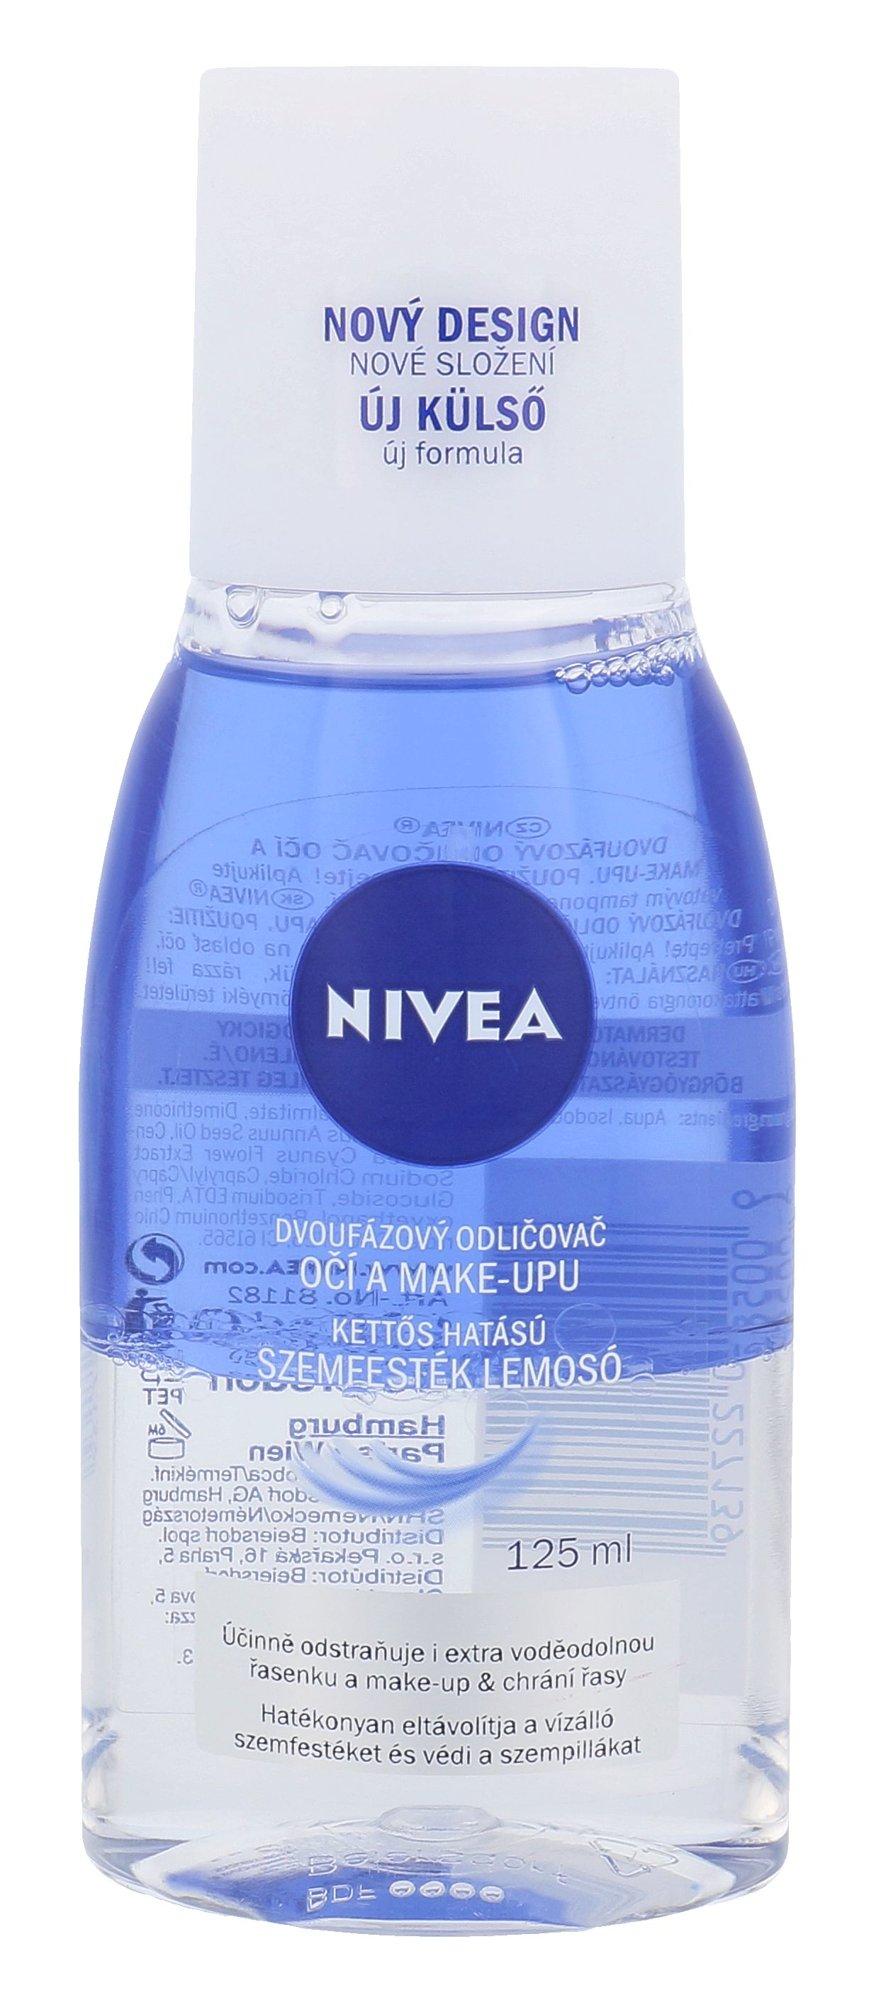 Blakstienų tušo valiklis Nivea Double Effect Eye Make-up Remover